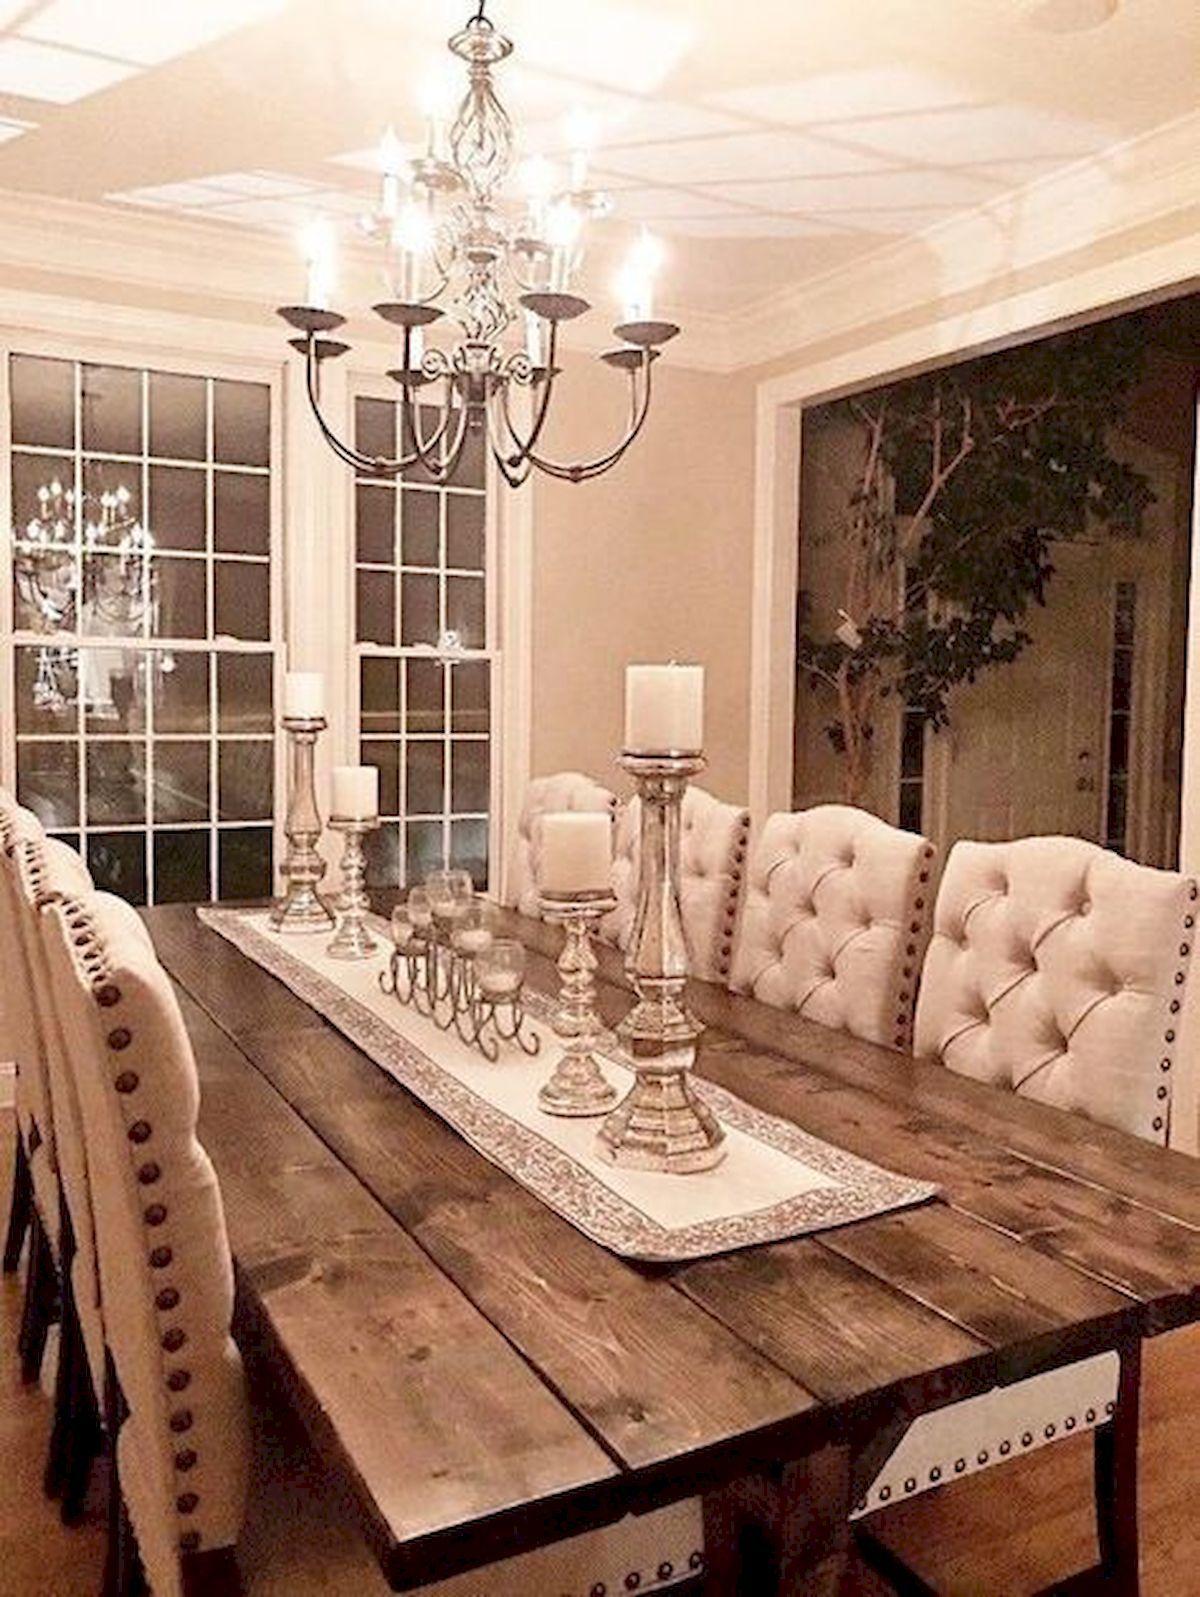 46 Great Farmhouse Tables Decoration Ideas Ide Dekorasi Rumah Dekor Dekorasi Ruang Tamu